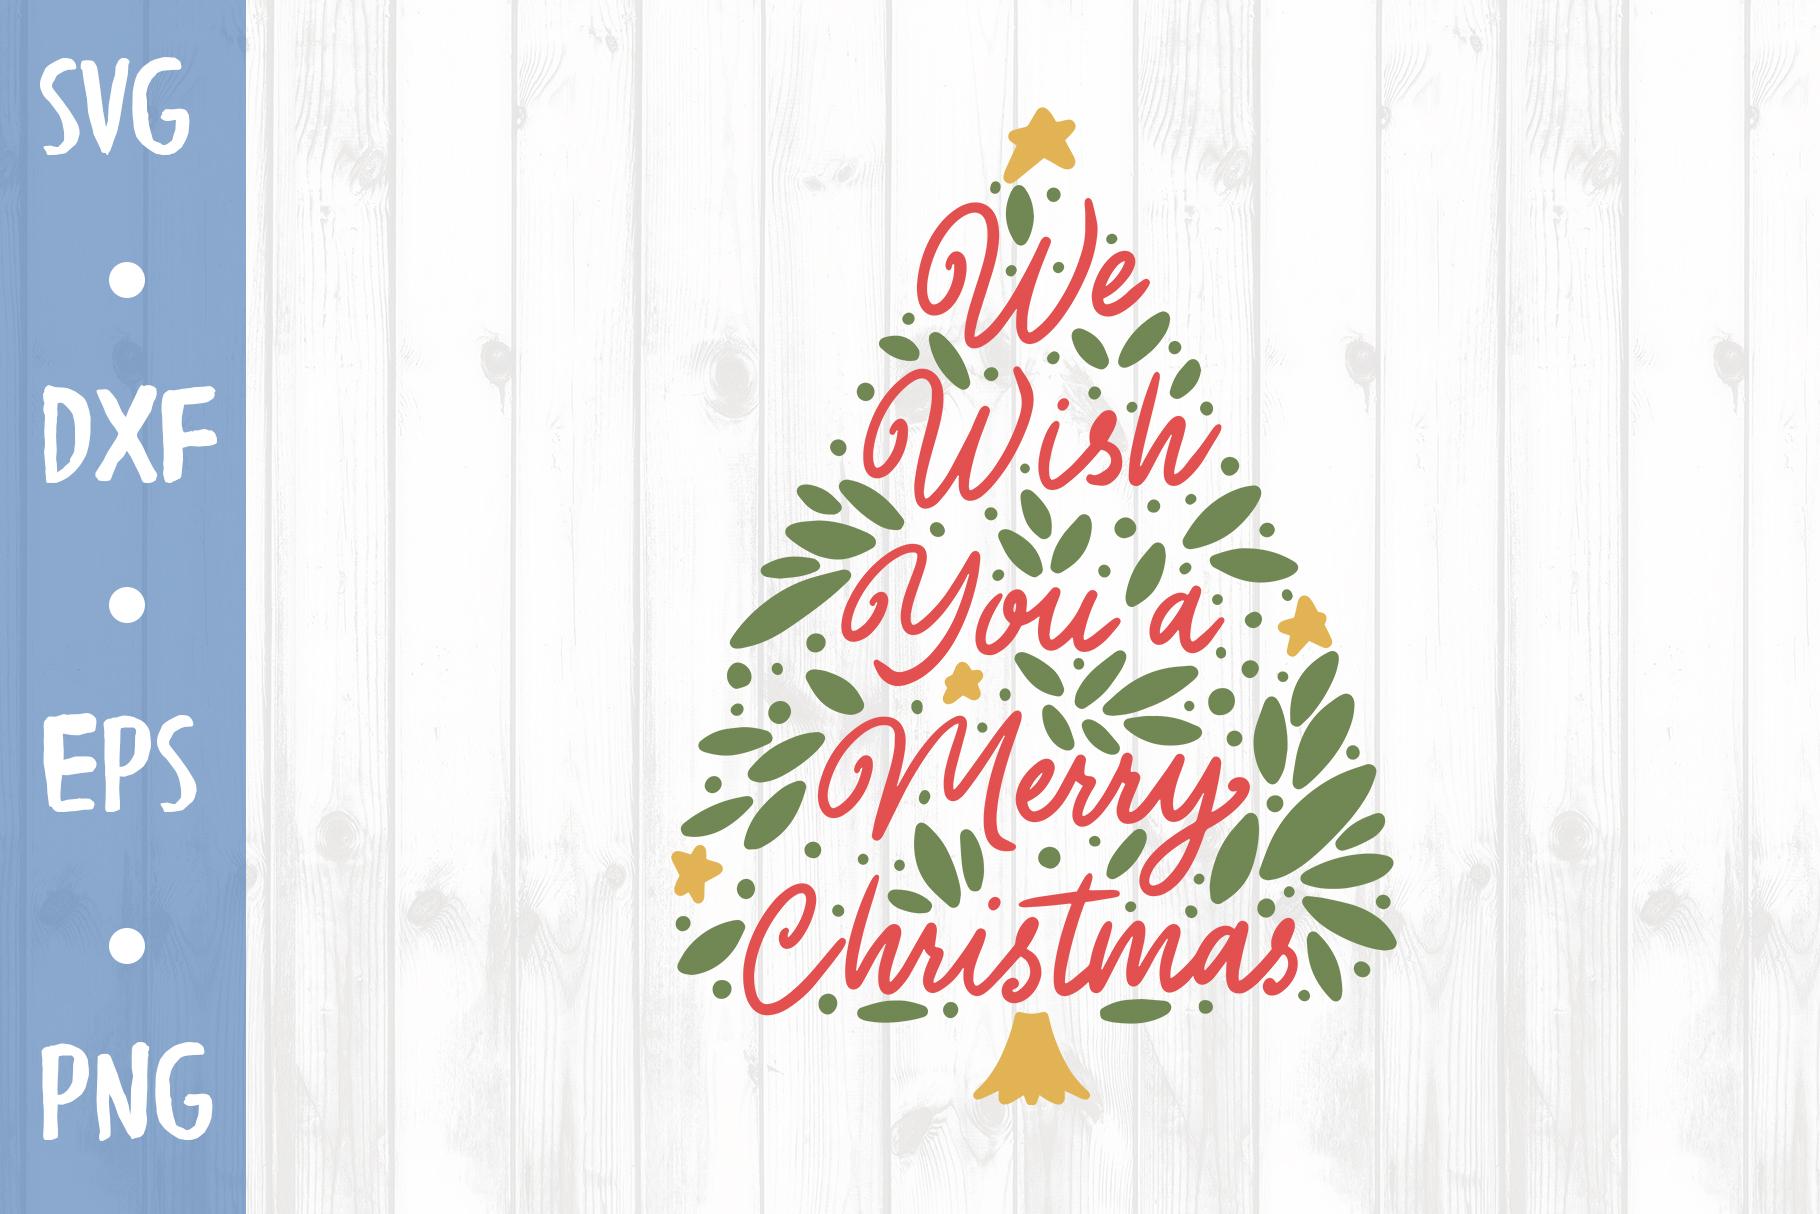 Christmas tree SVG CUT FILE example image 1